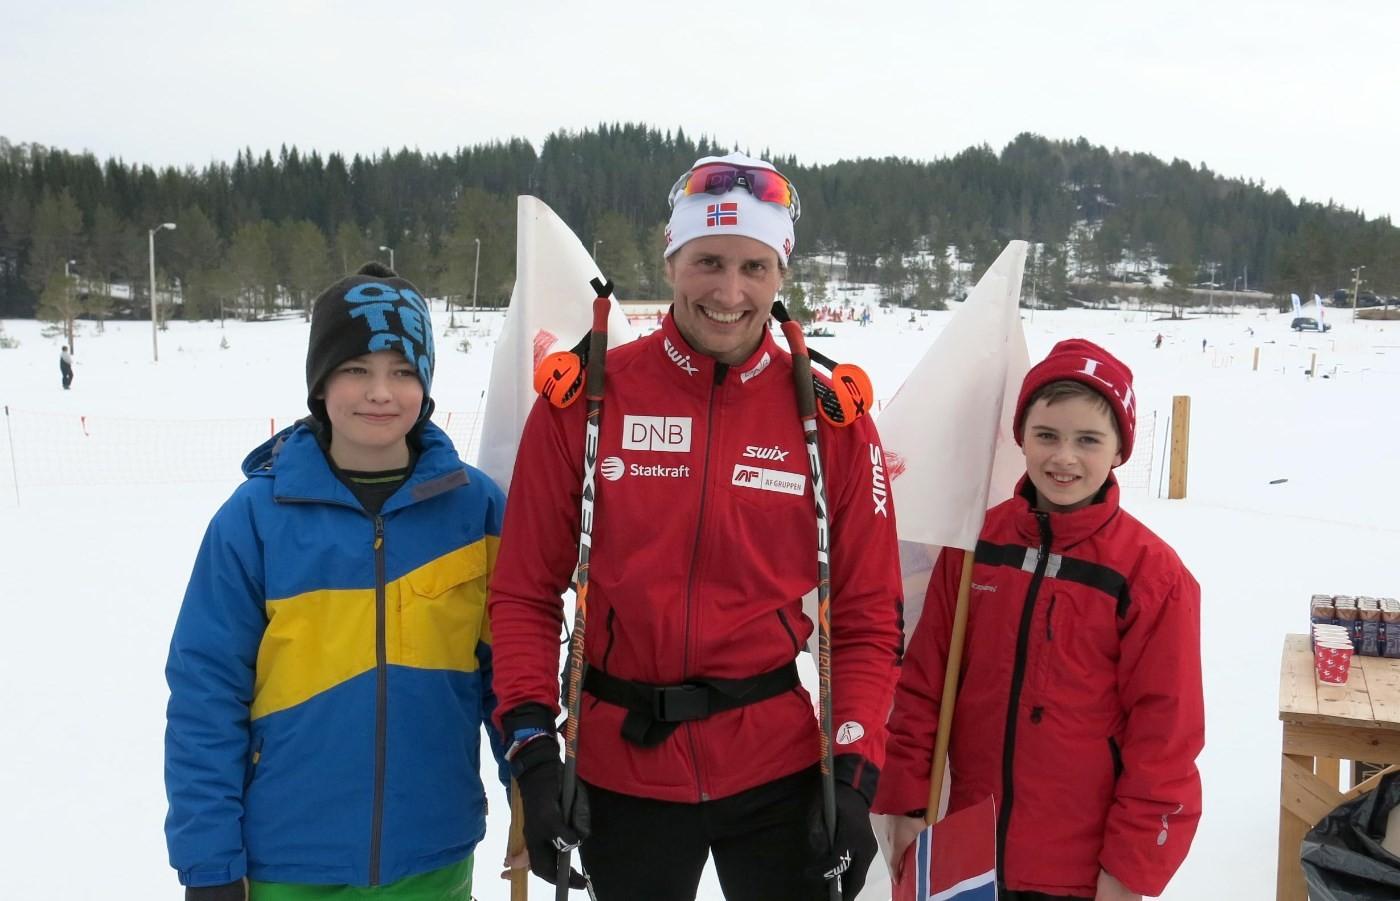 Bror og Erik helsa på Nils Erik Ulset på Nordmarka - og bilete vart det!  Arkivfoto: Dordi Jorunn Halle